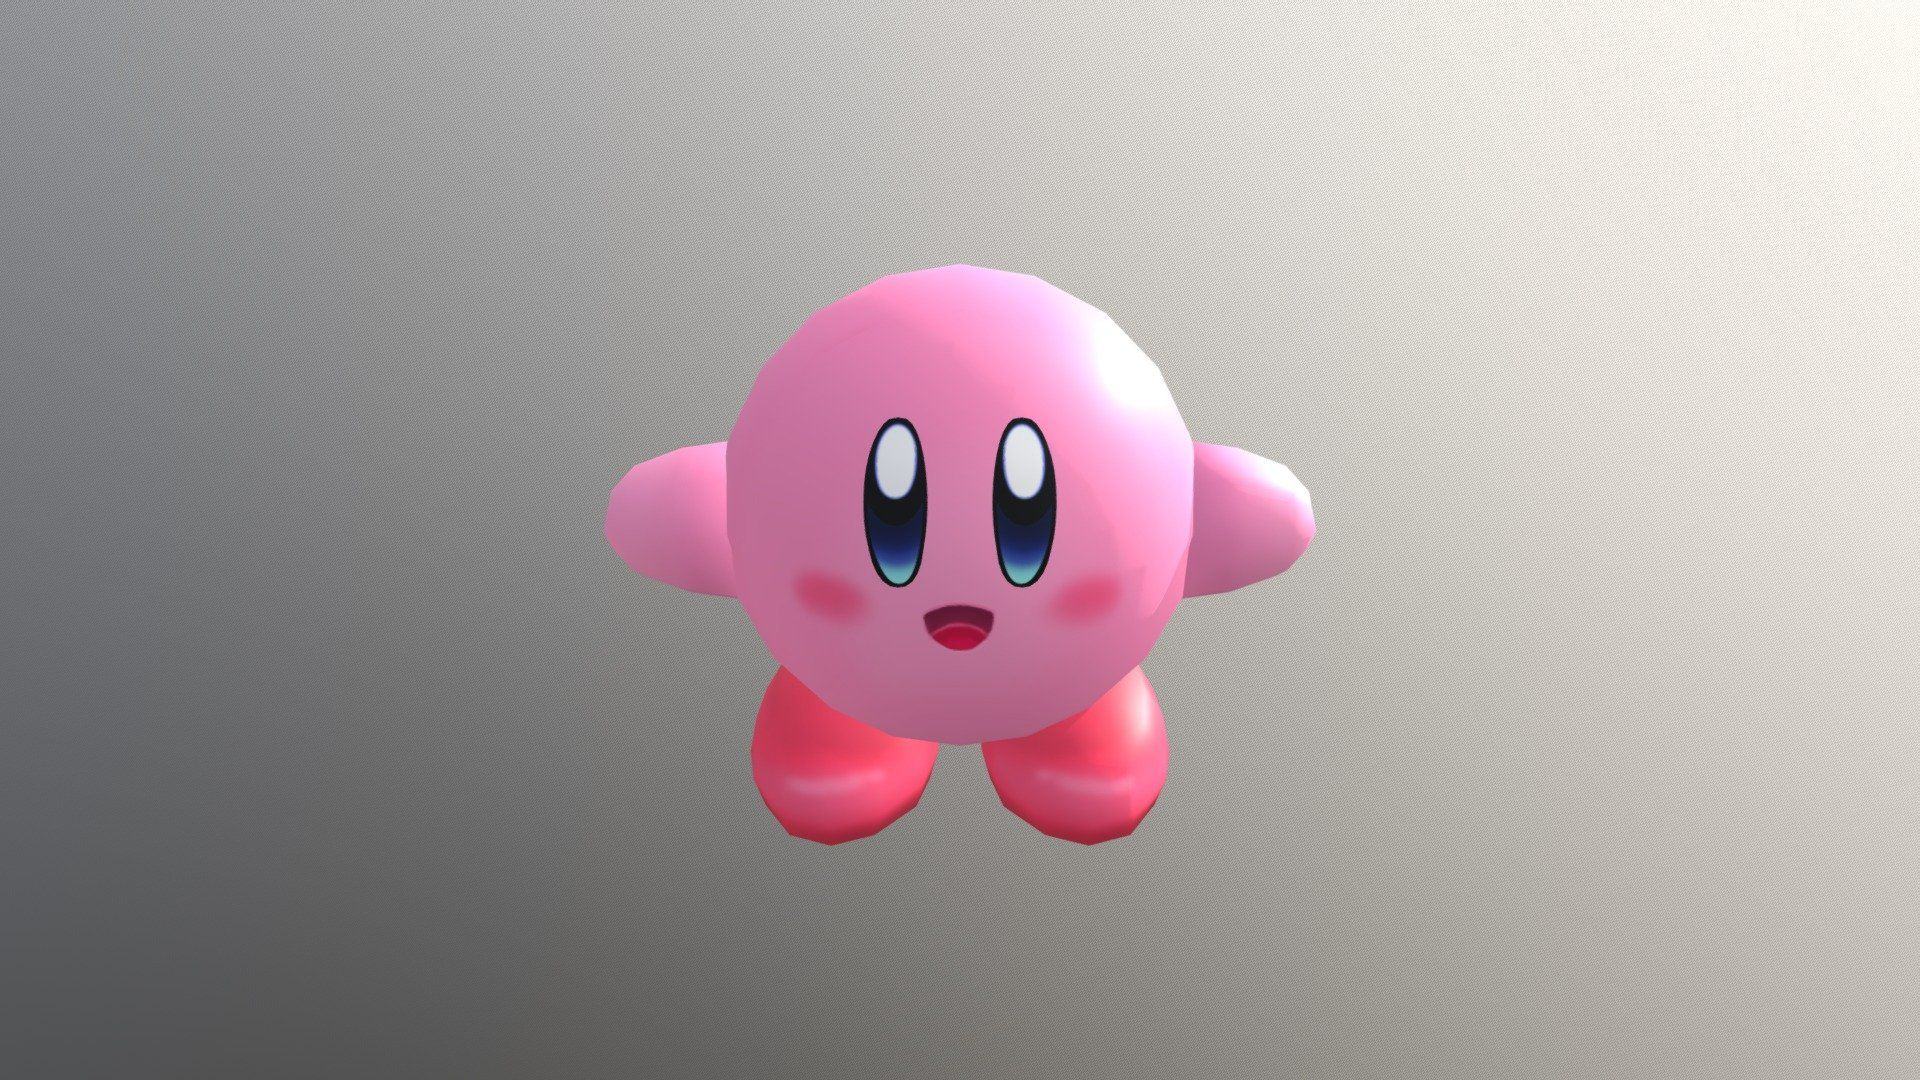 Kirby hd wallpaper for laptop